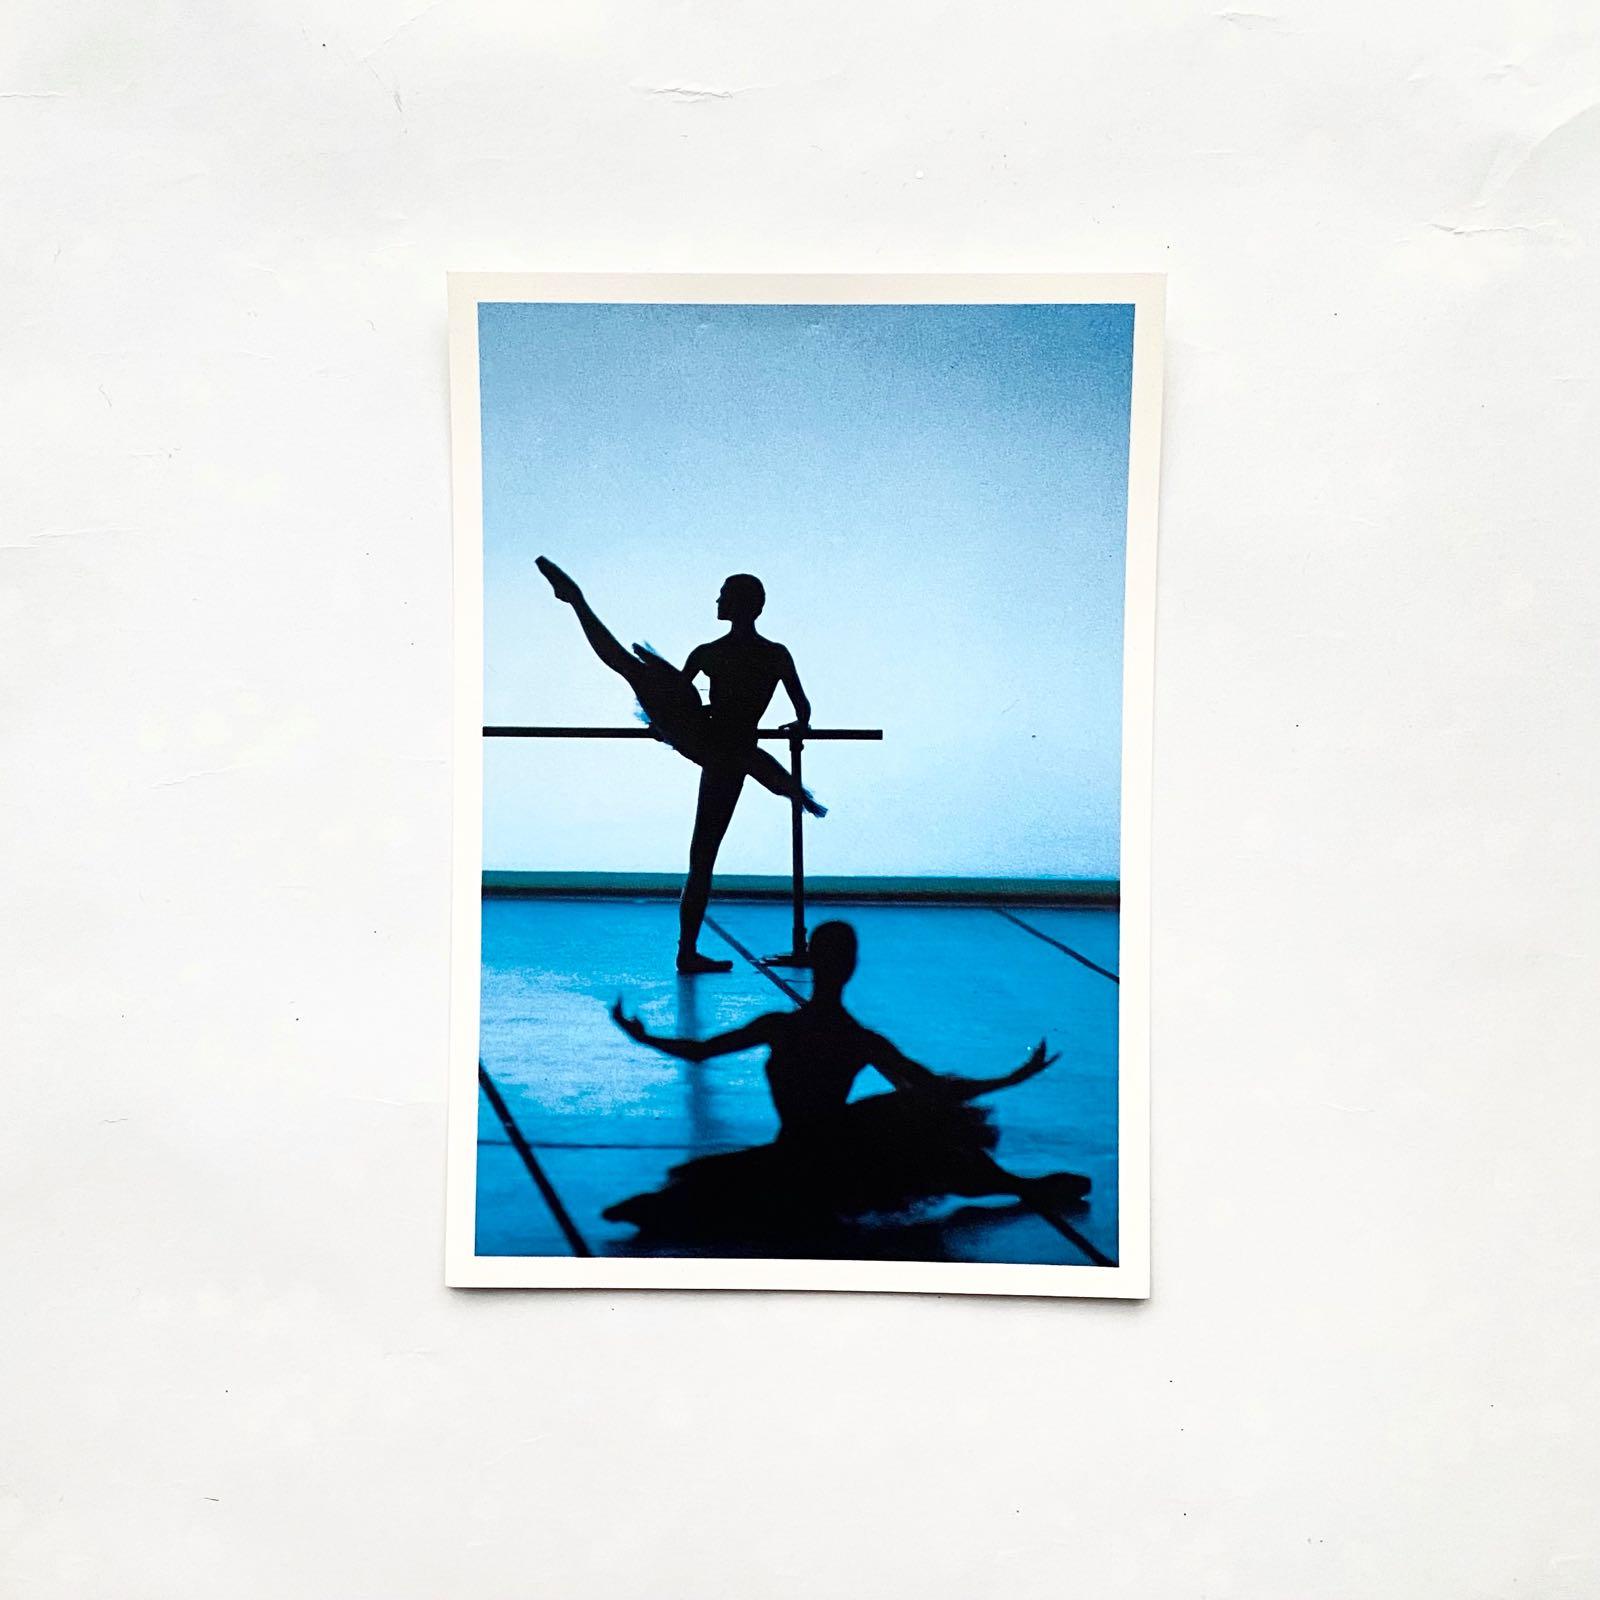 Kortti, silhouettes  1